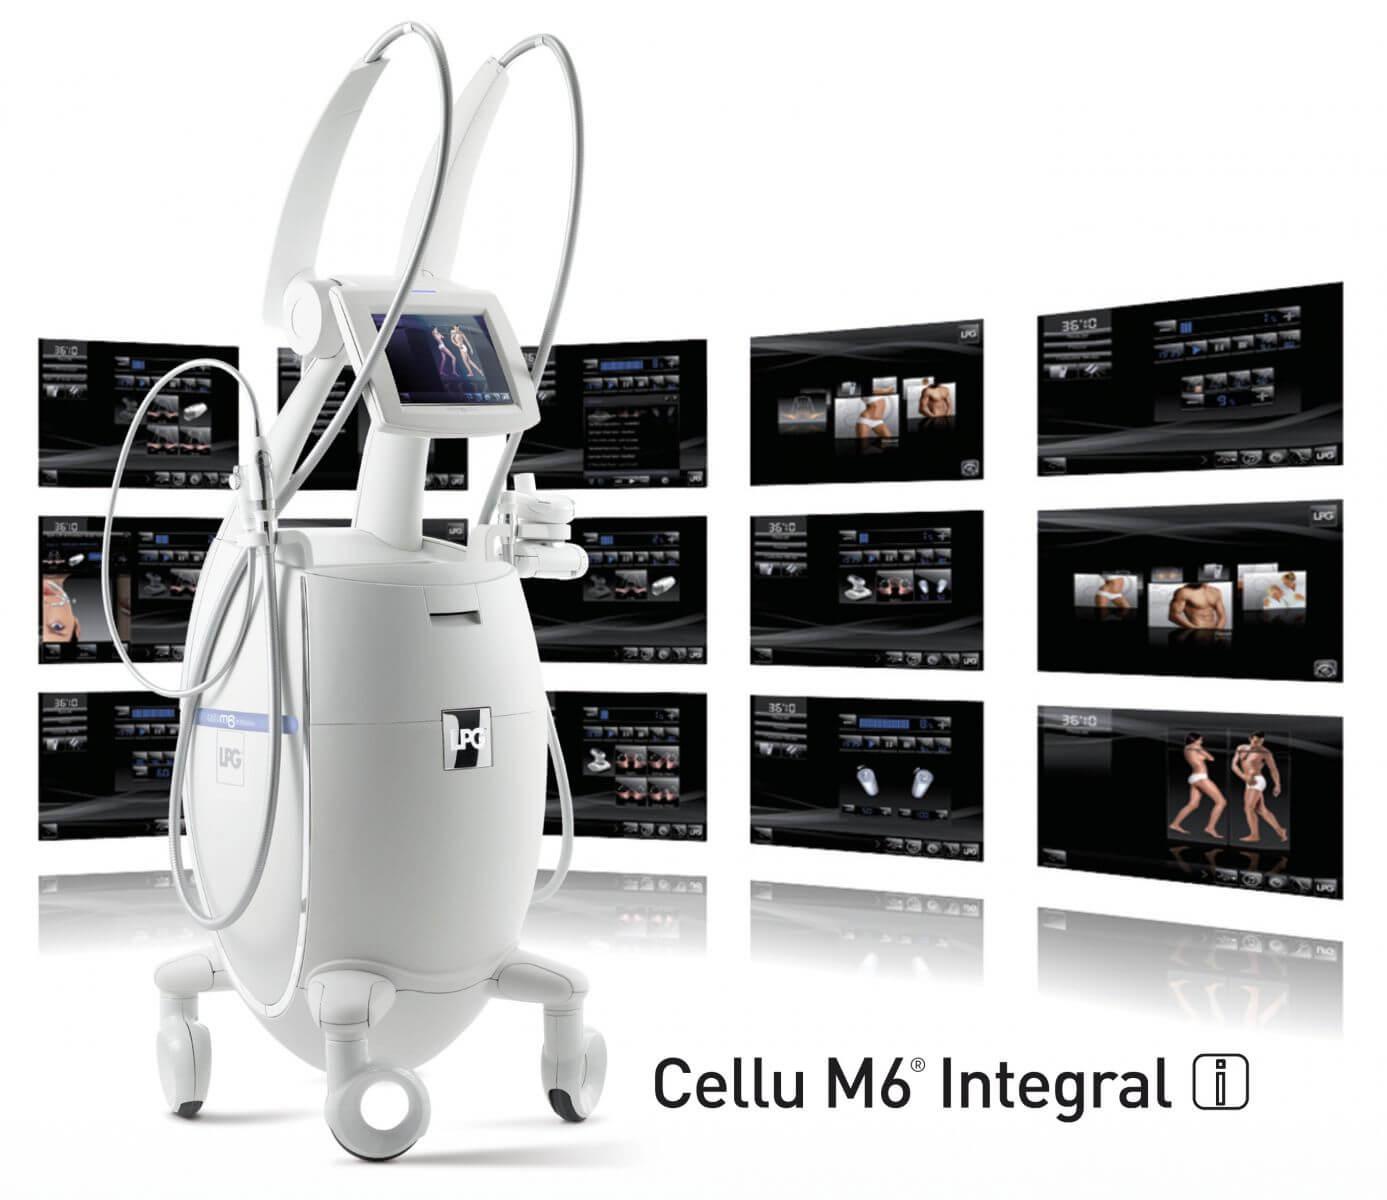 integral wirtualny trener11 - LPG Cellu M6 Integral - обзор аппарата